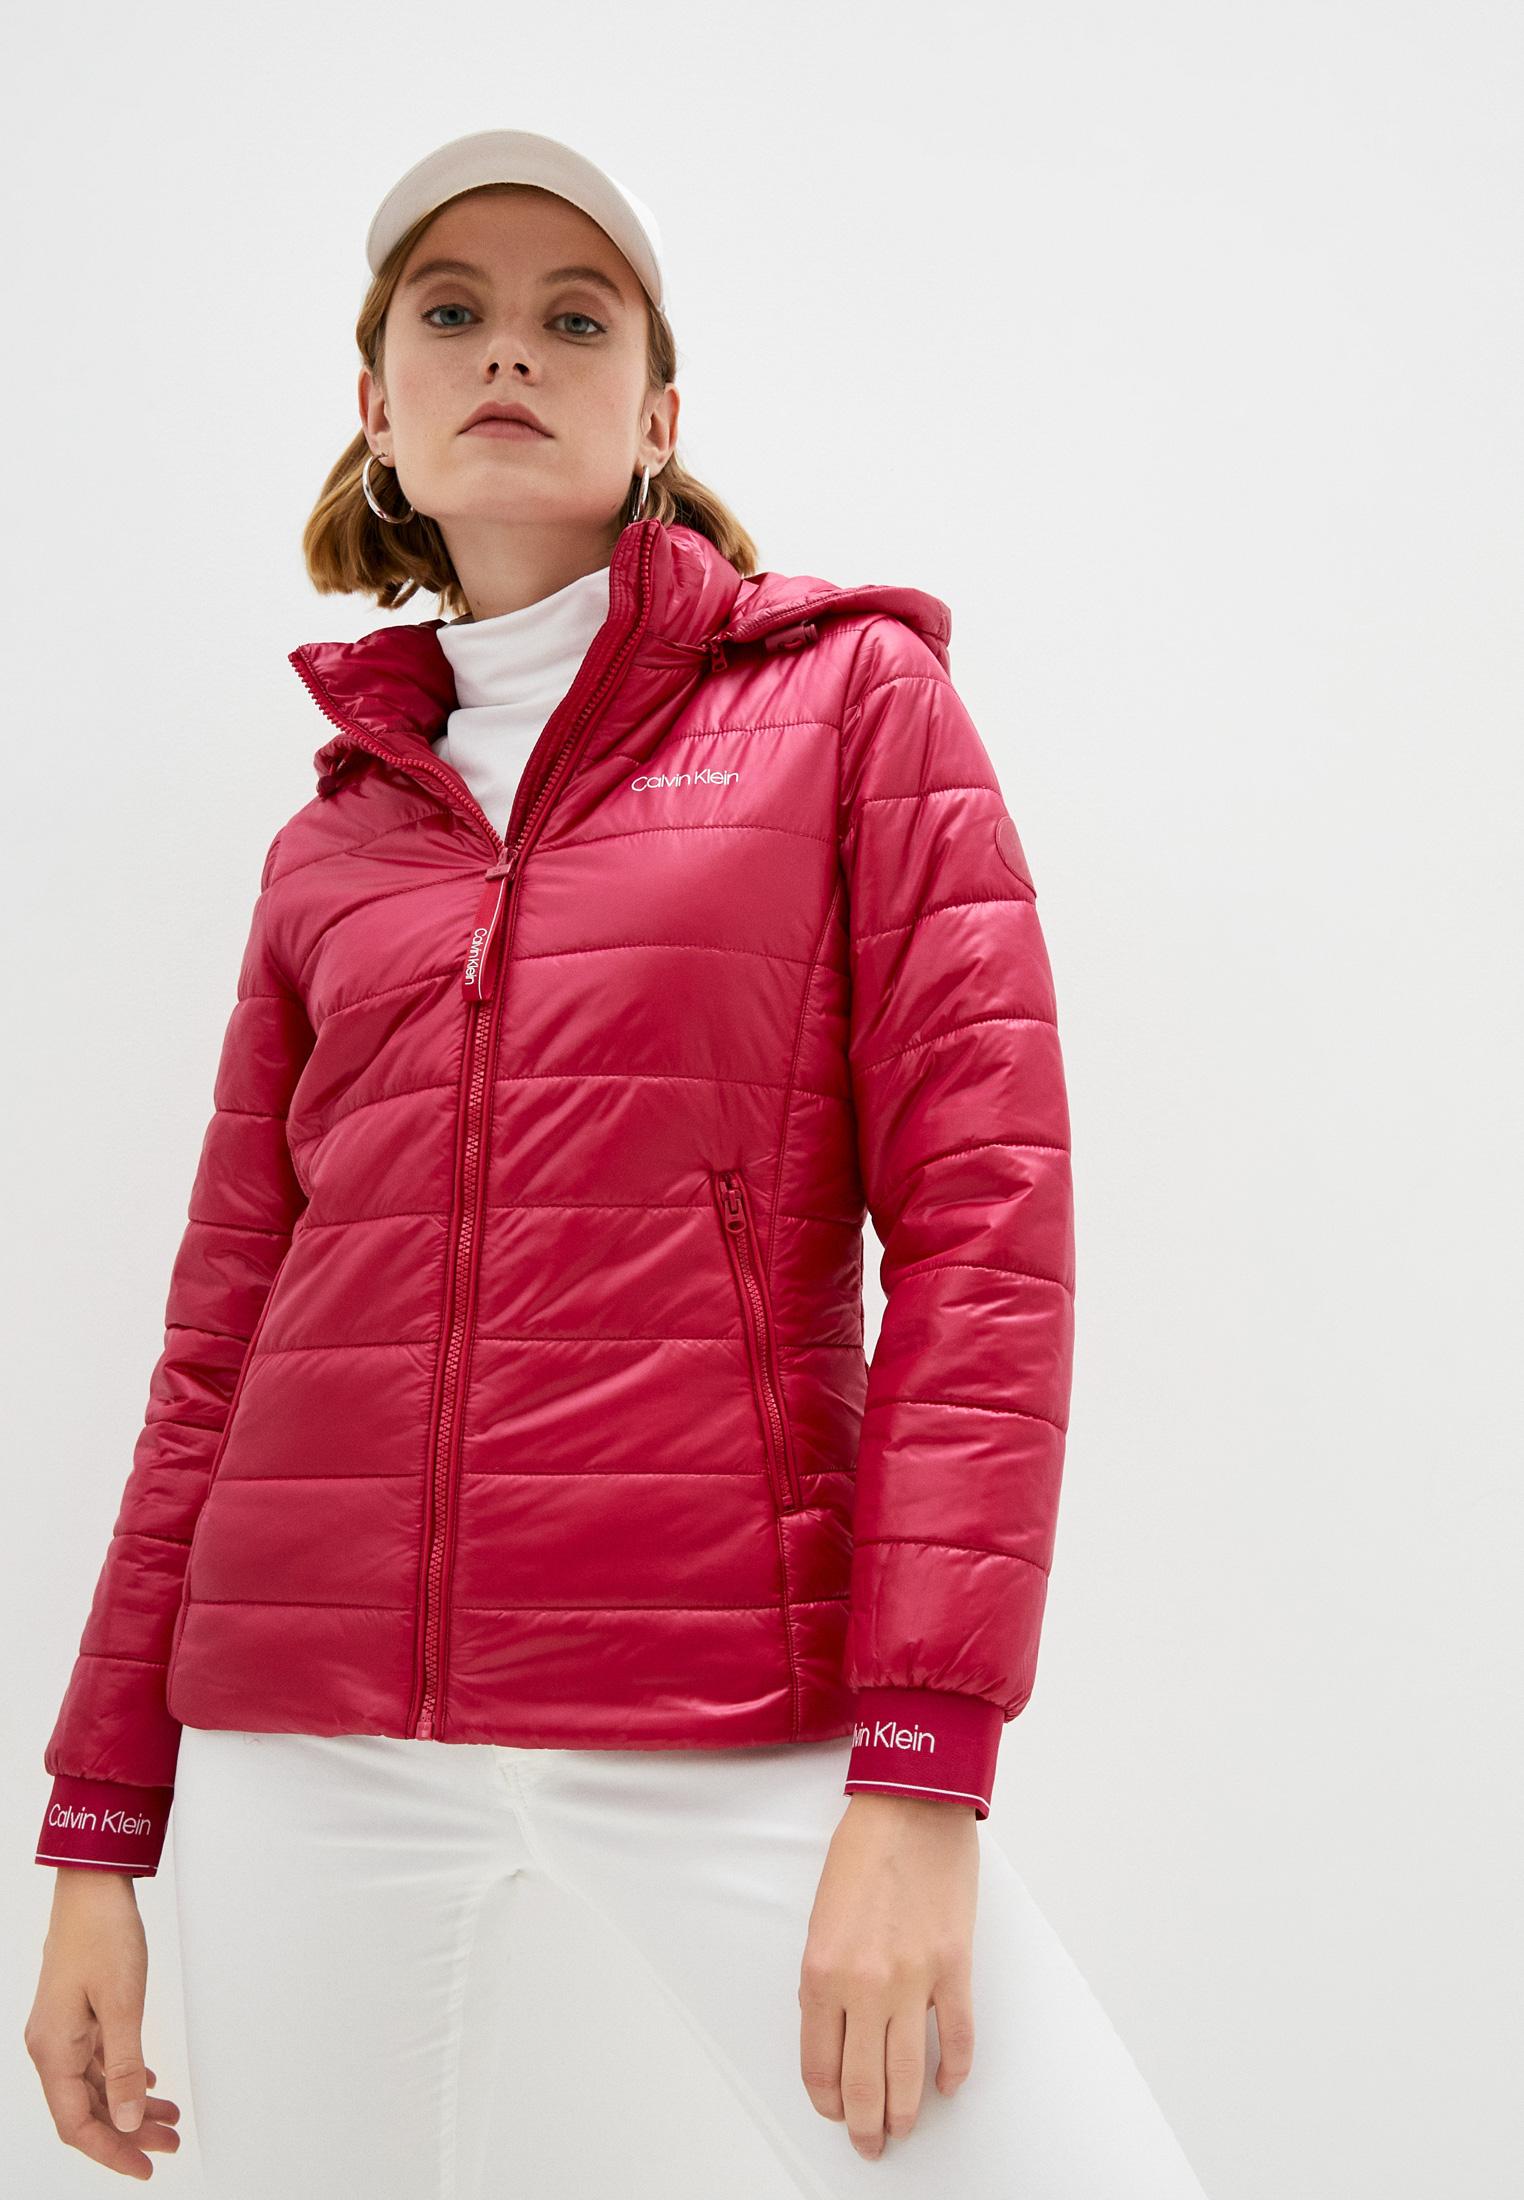 Утепленная куртка Calvin Klein (Кельвин Кляйн) Куртка утепленная Calvin Klein